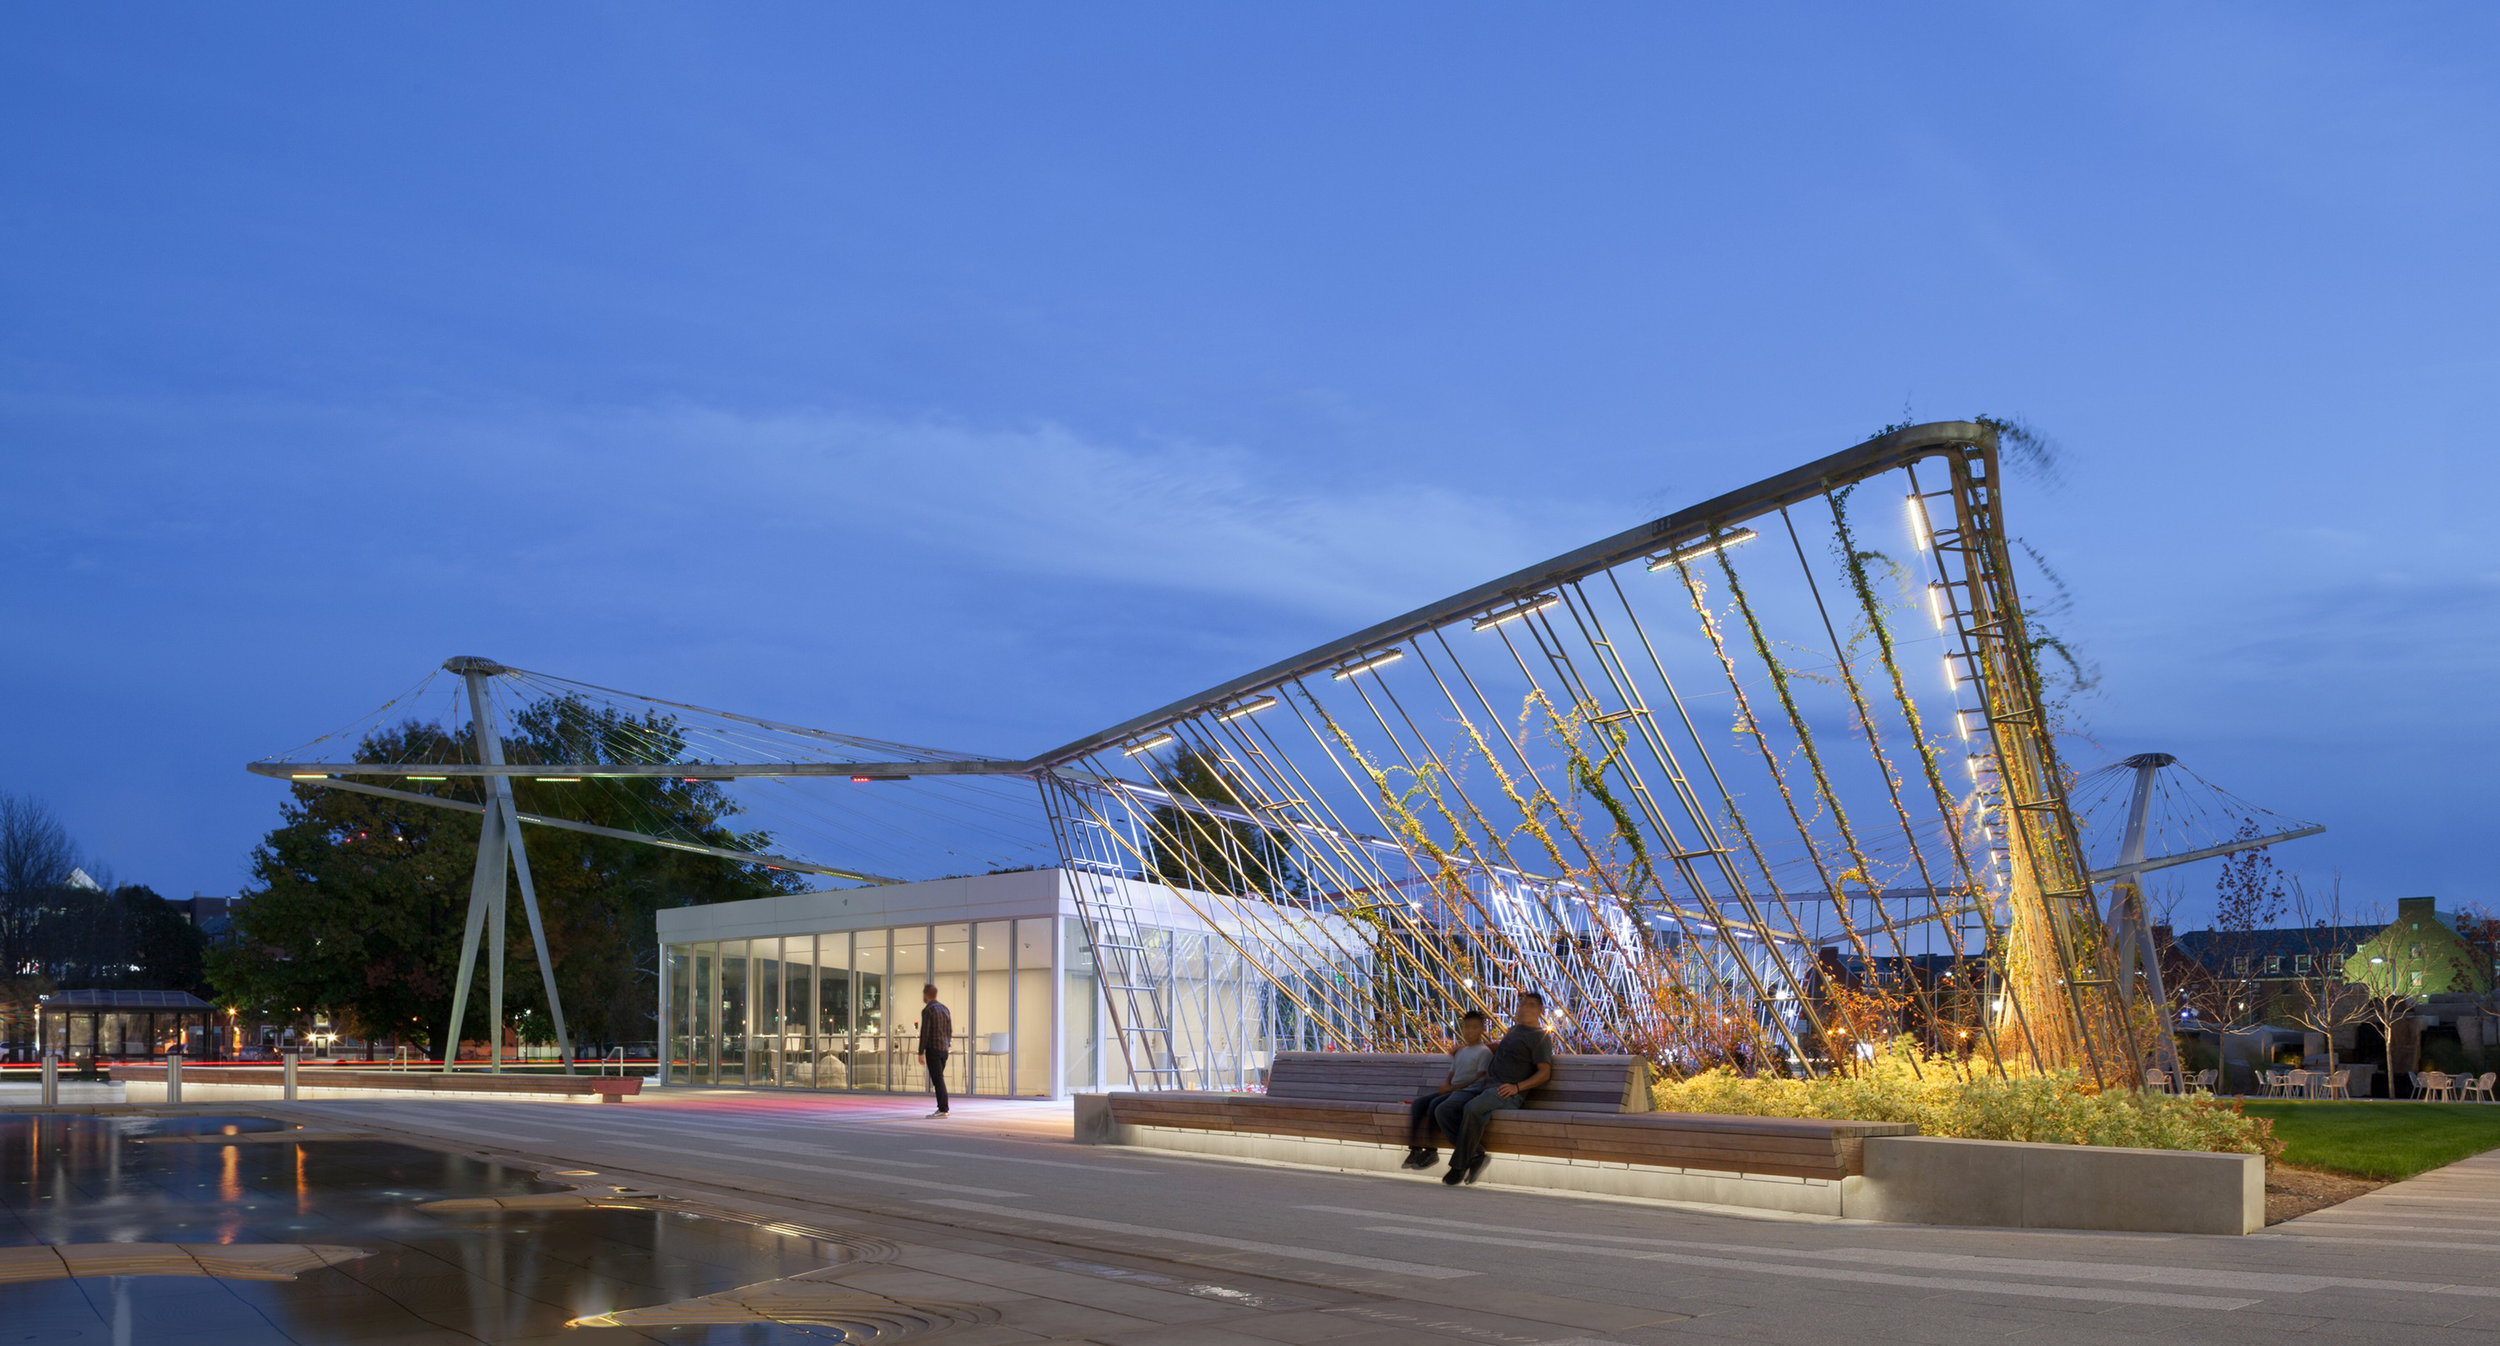 Wishard Pavilion